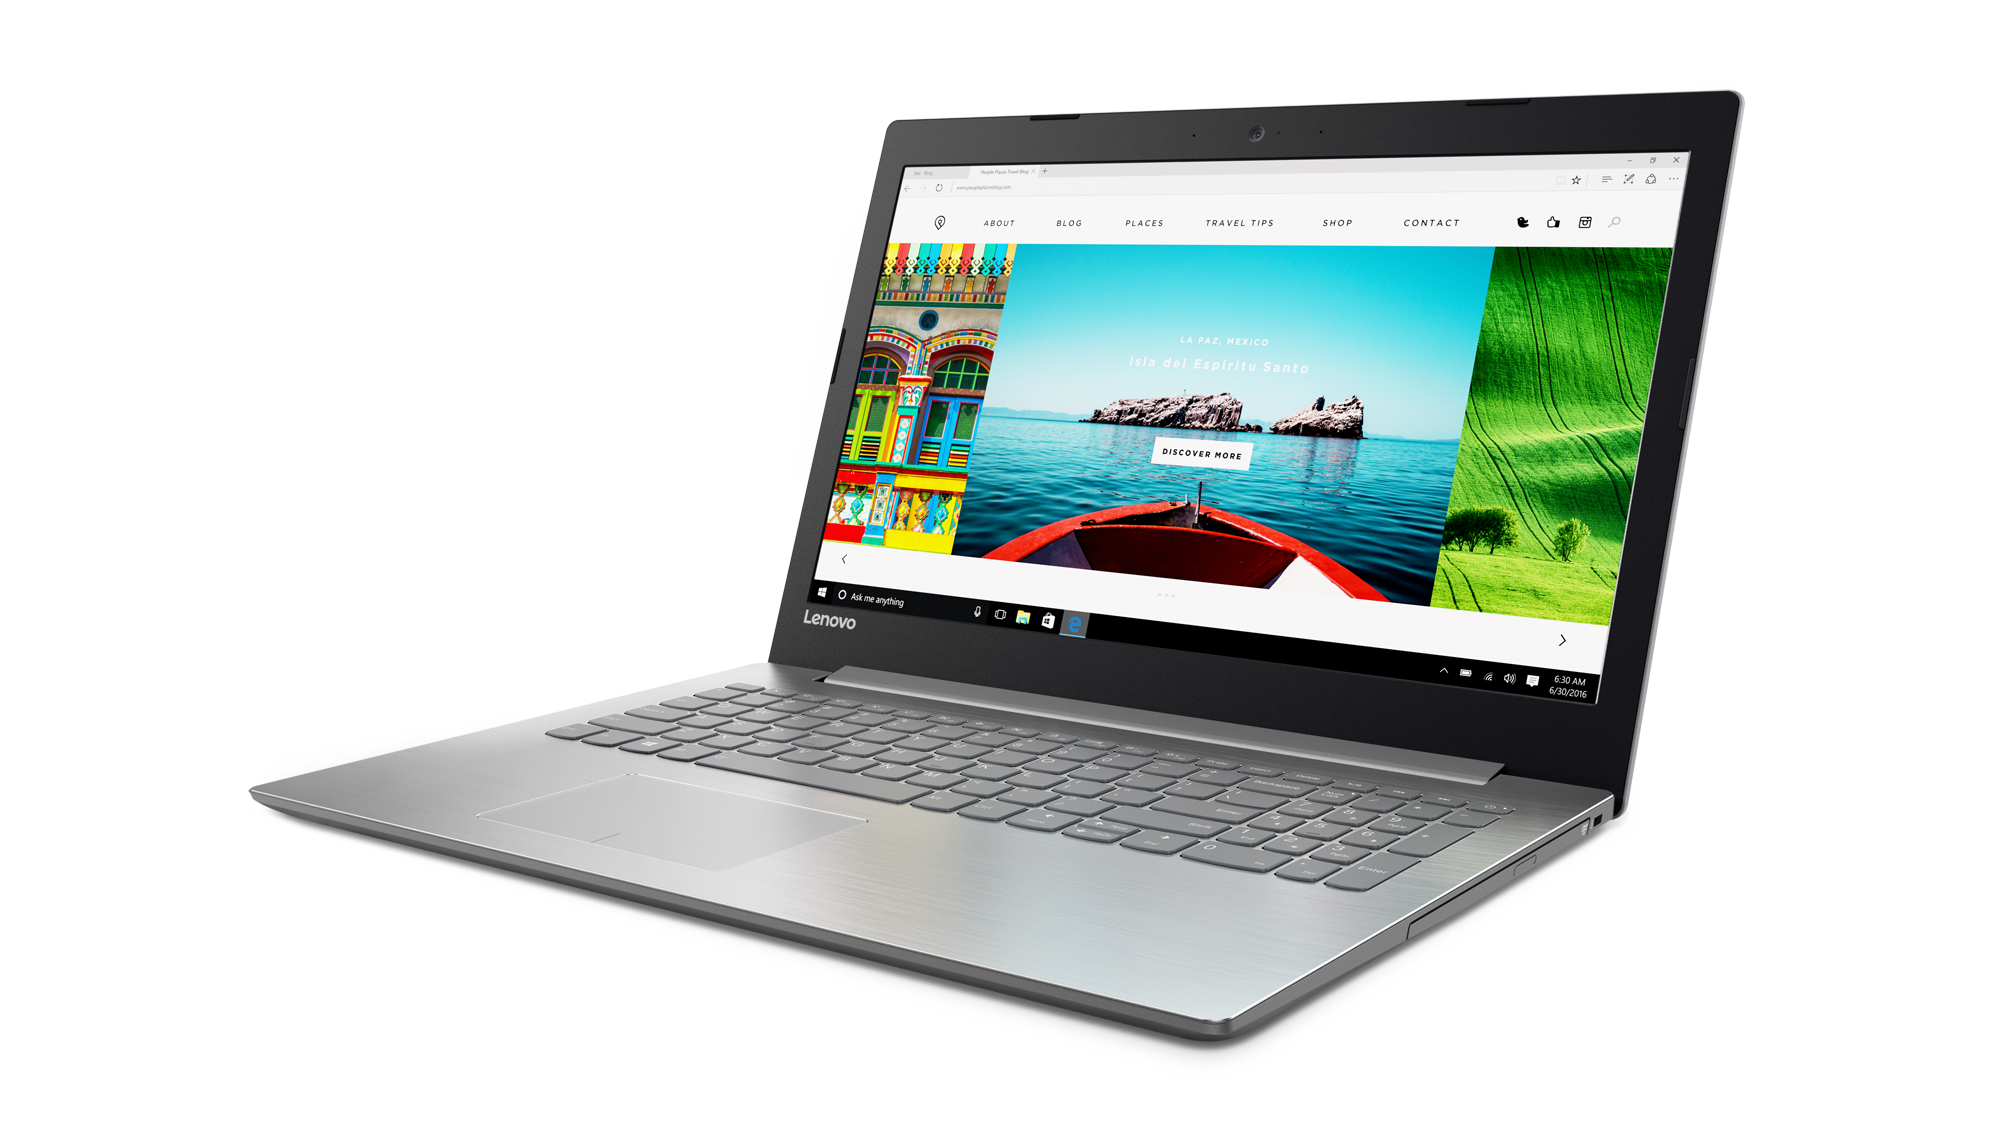 "Lenovo IdeaPad 320-15ISK i3-6006U 2,00GHz/6GB/SSD 256GB/15,6"" FHD/AG/WIN10 šedá 80XH003RCK"